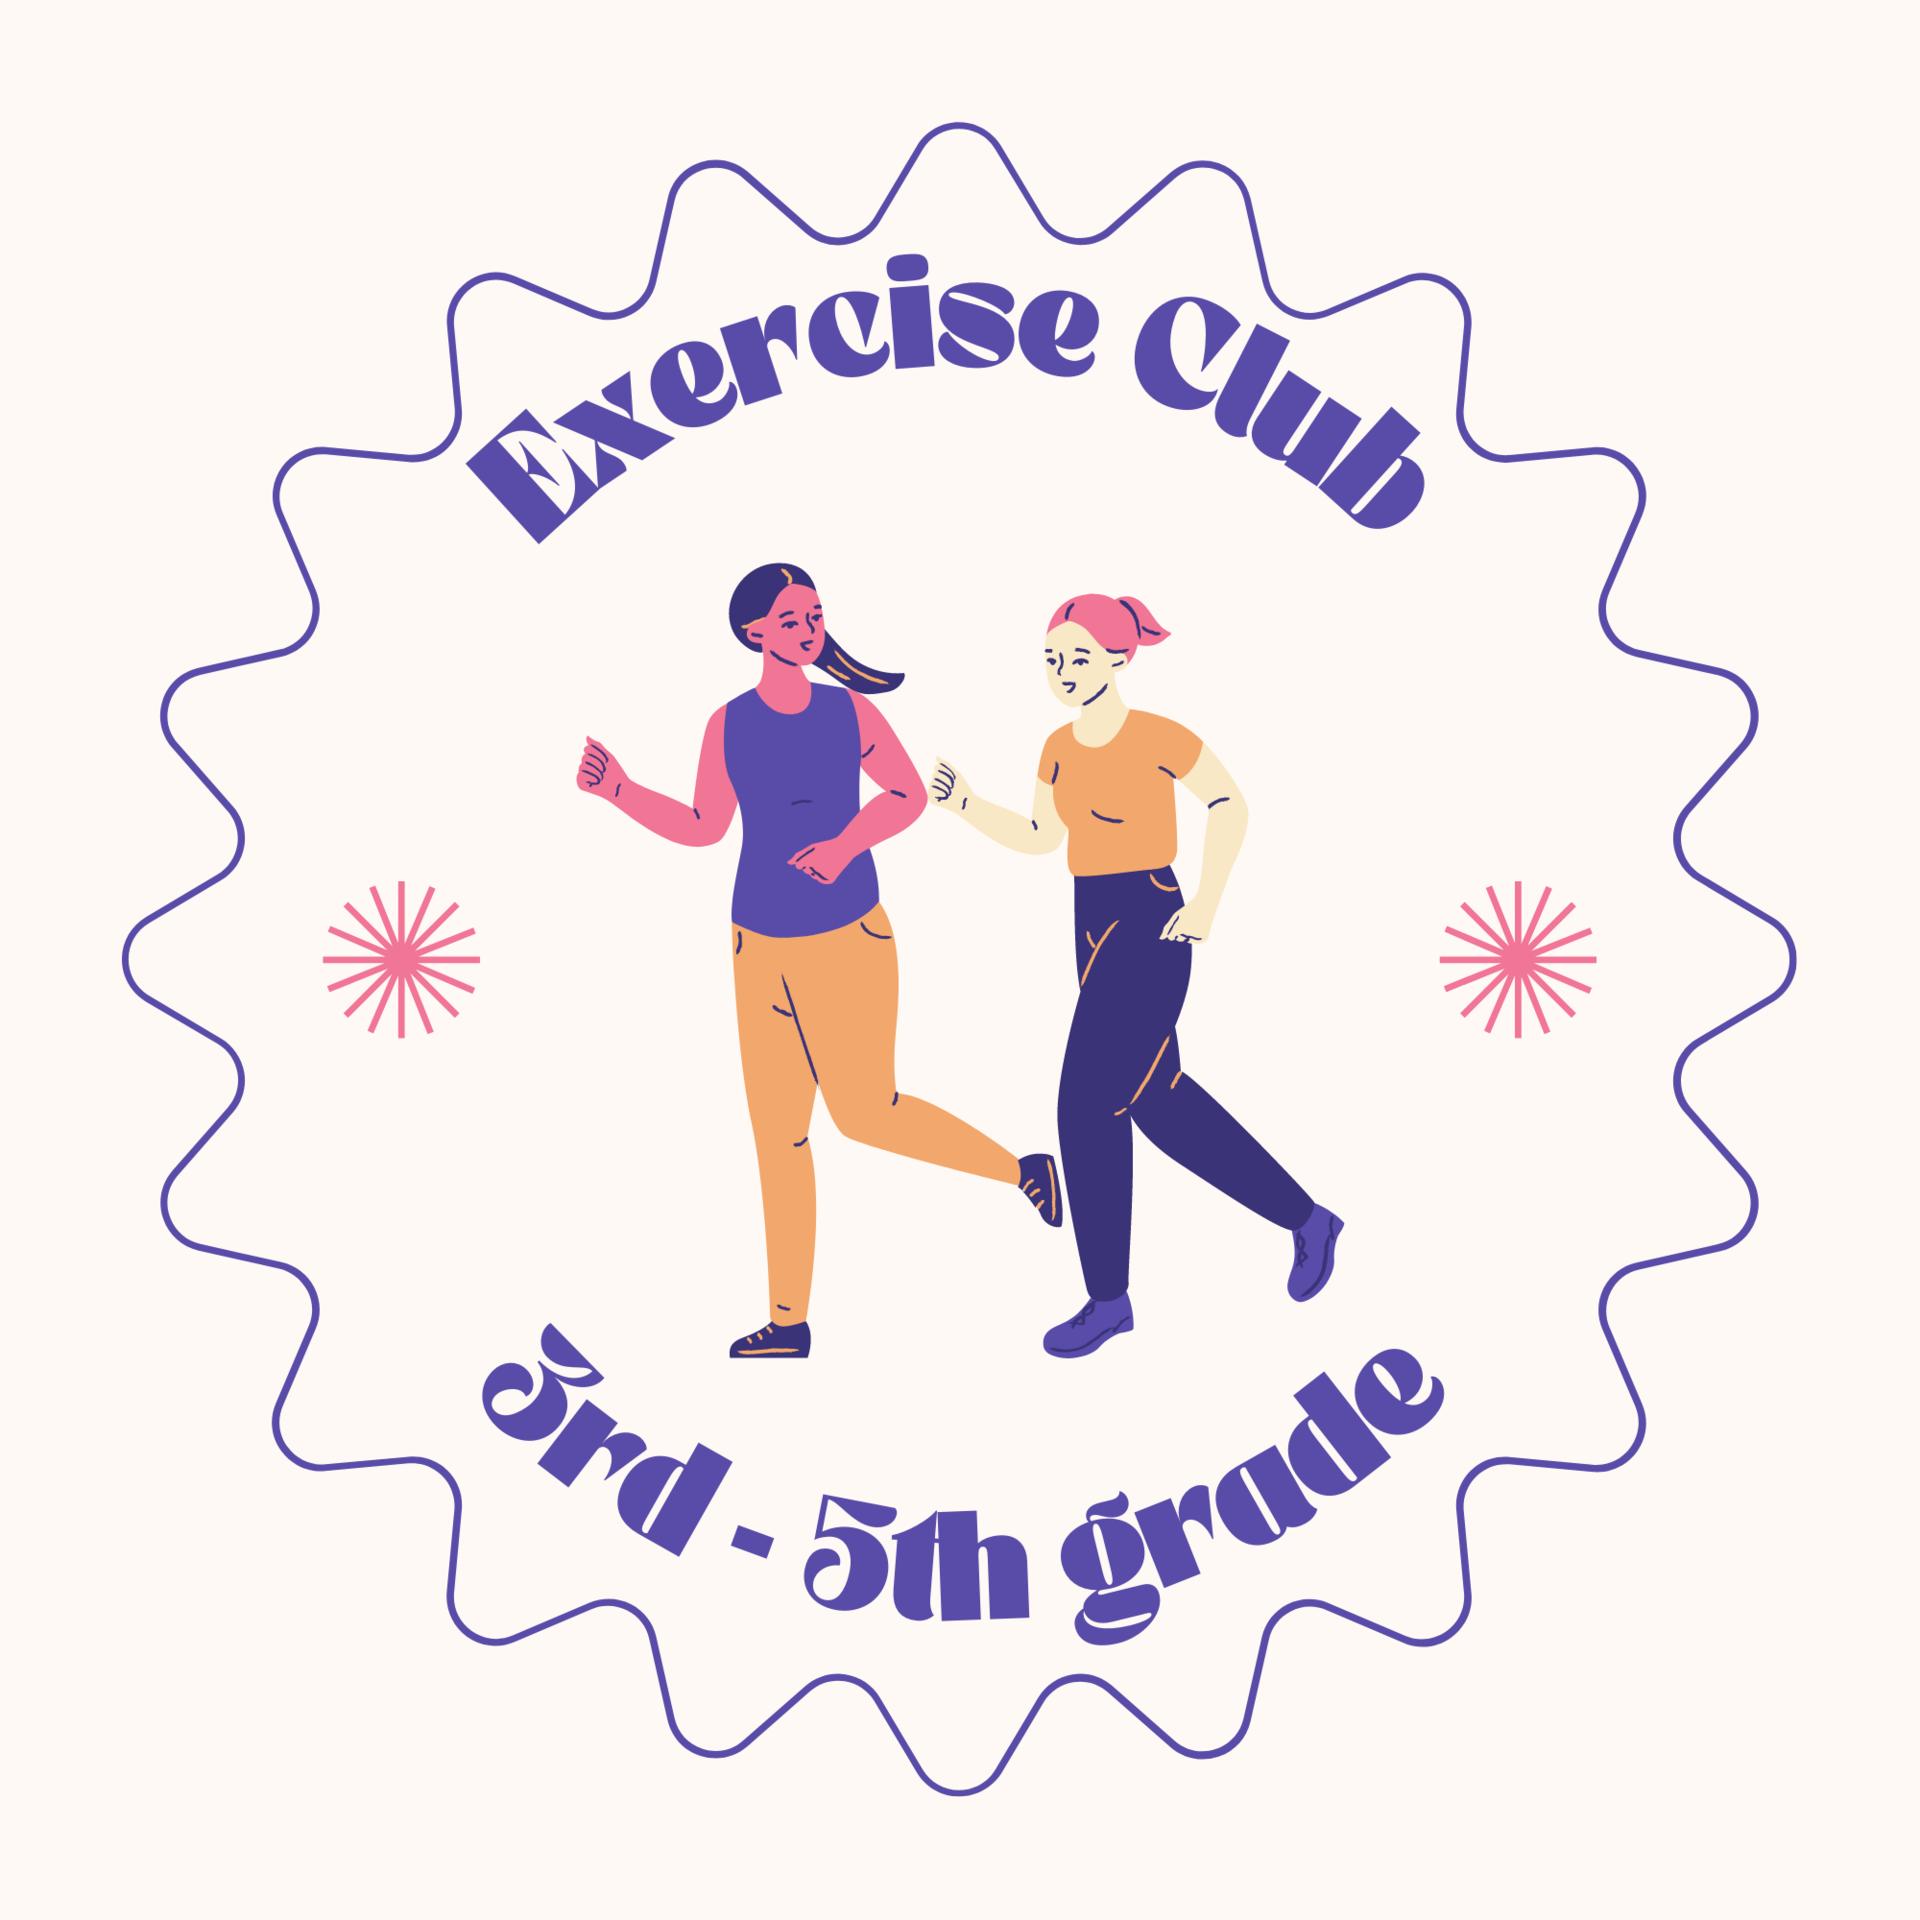 Exercise Club